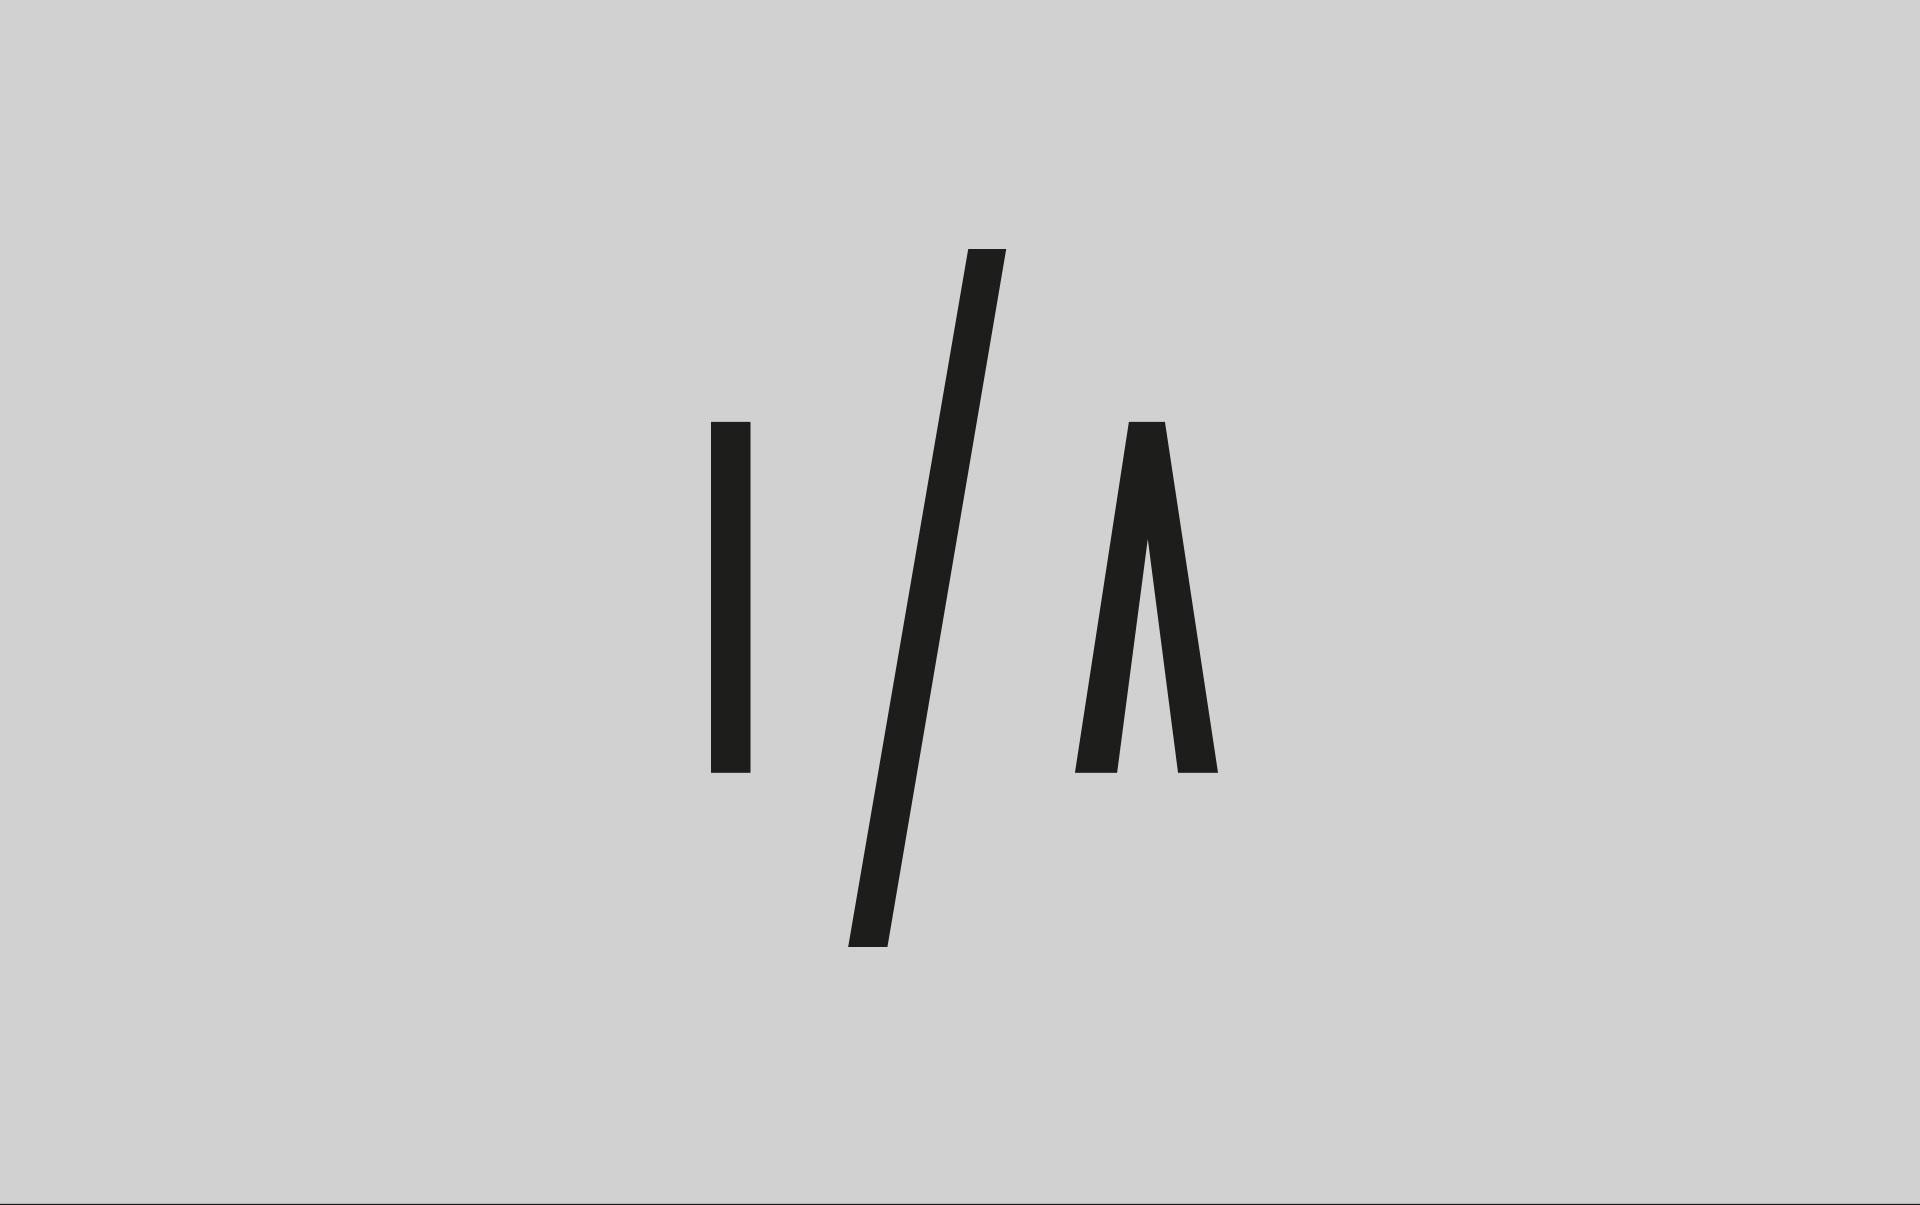 ilario-alicante-logo1